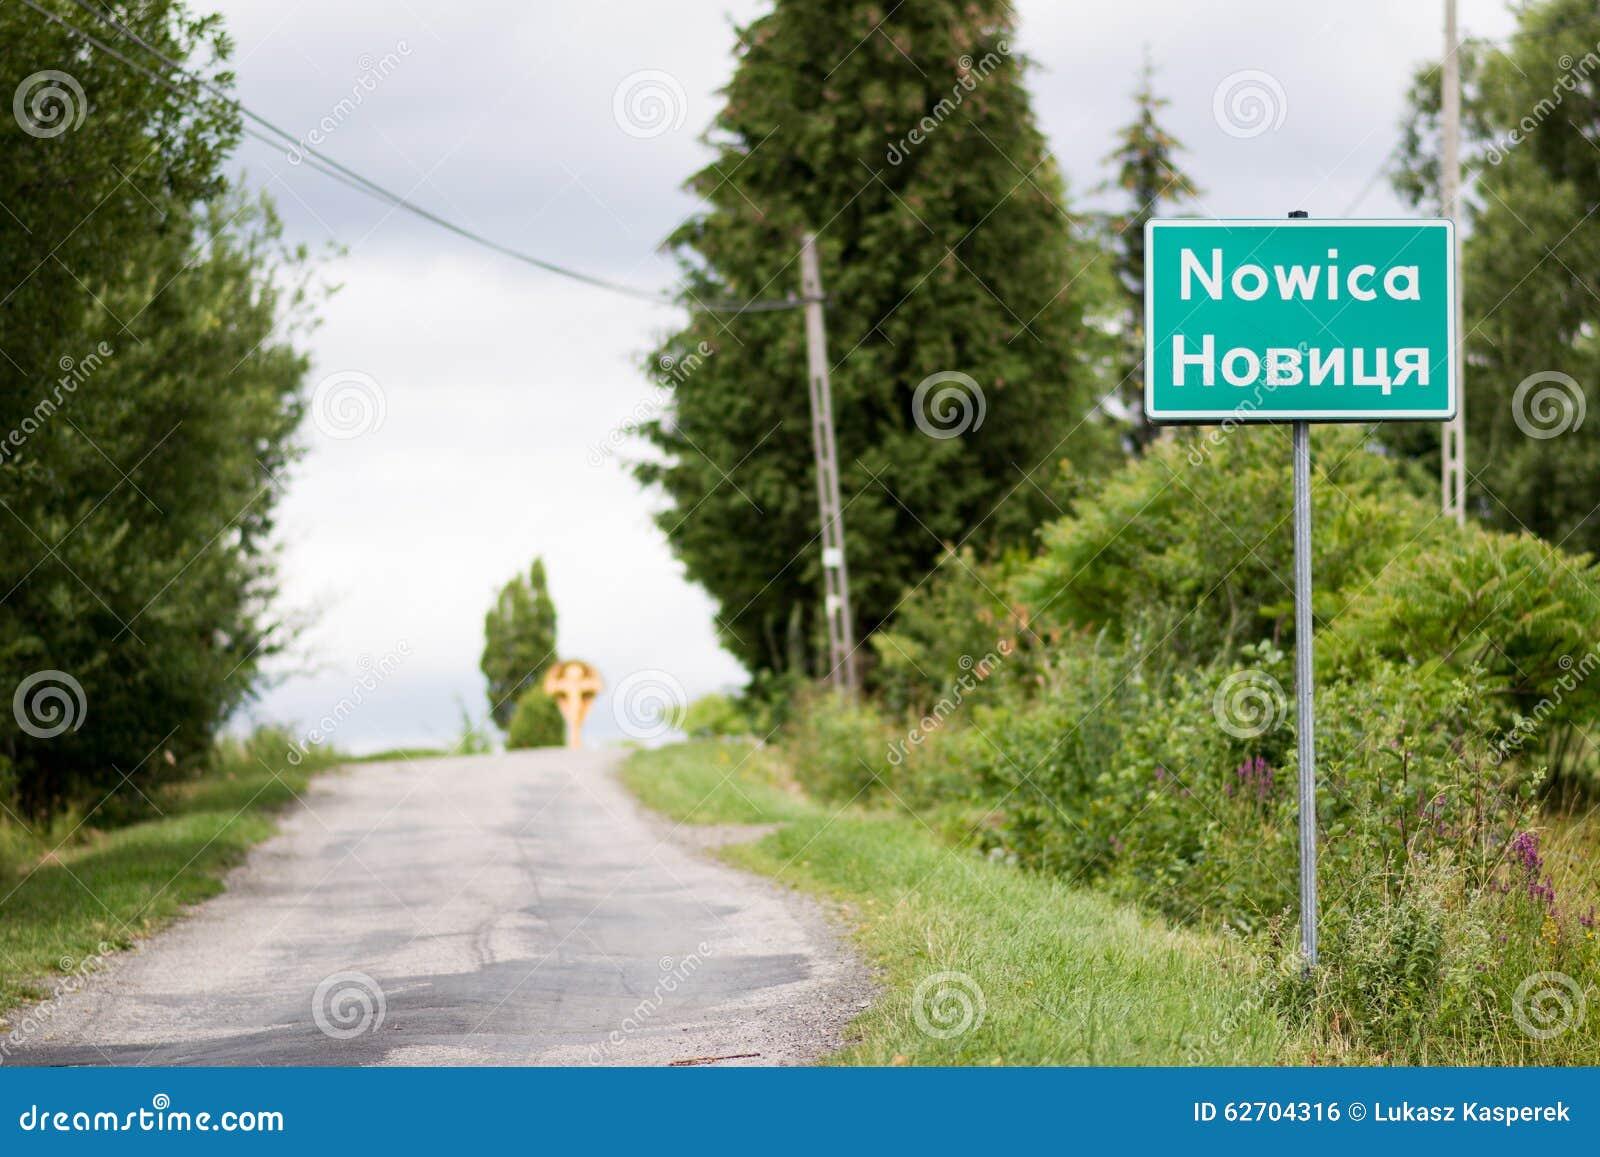 Nowica - χωριό σε χαμηλότερο Beskid, Πολωνία